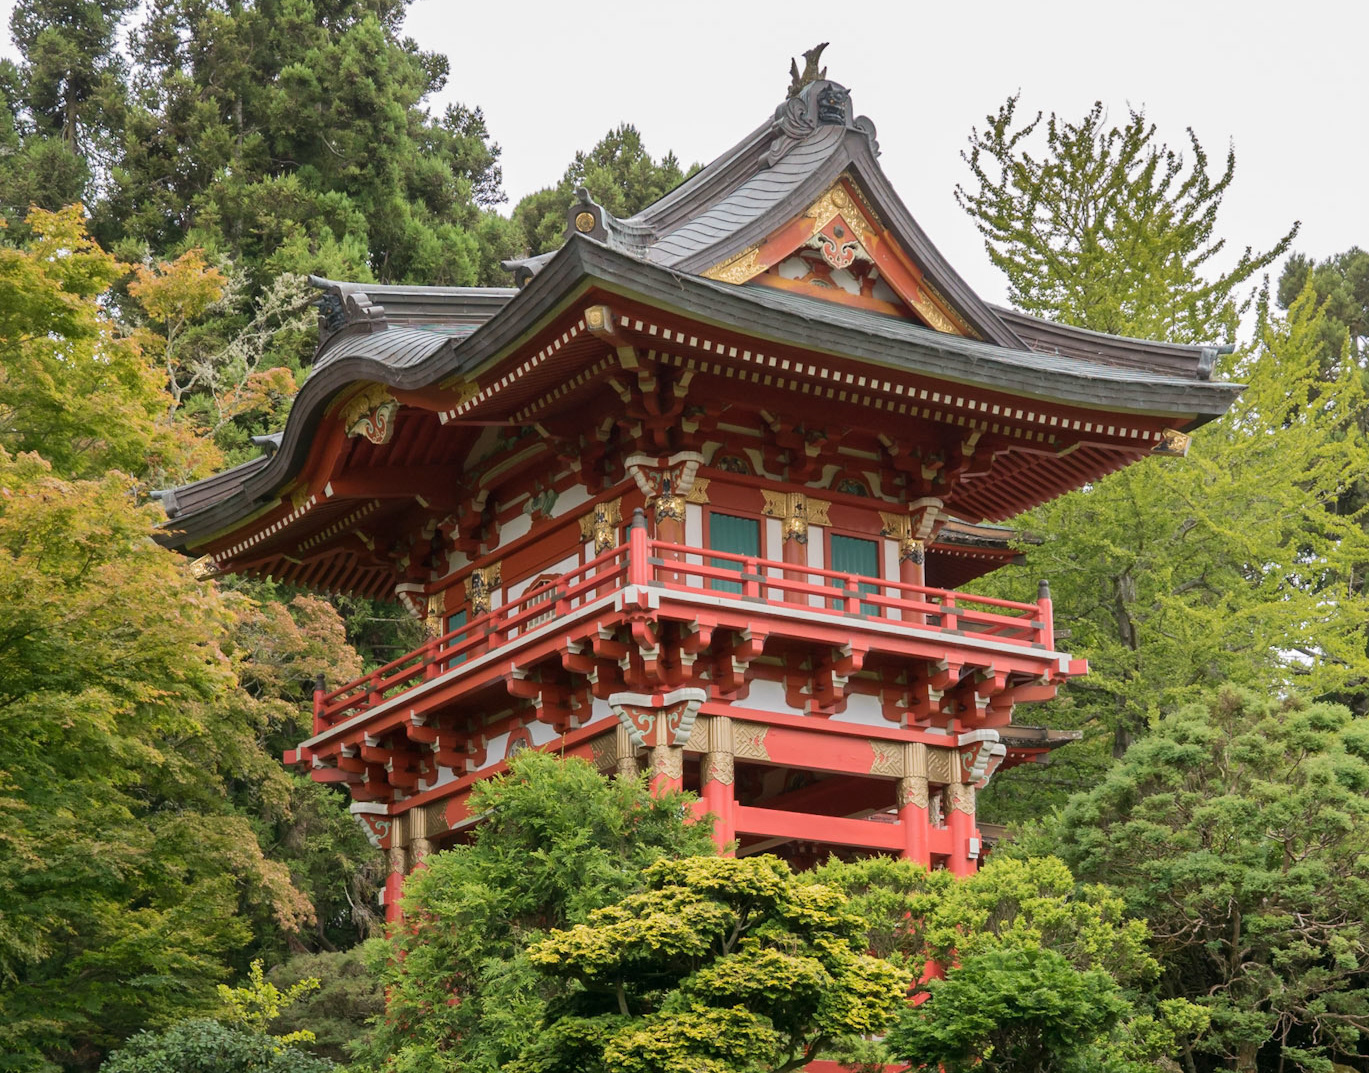 Juan Matorras Díaz-Caneja - Japanese Tea Garden, SF